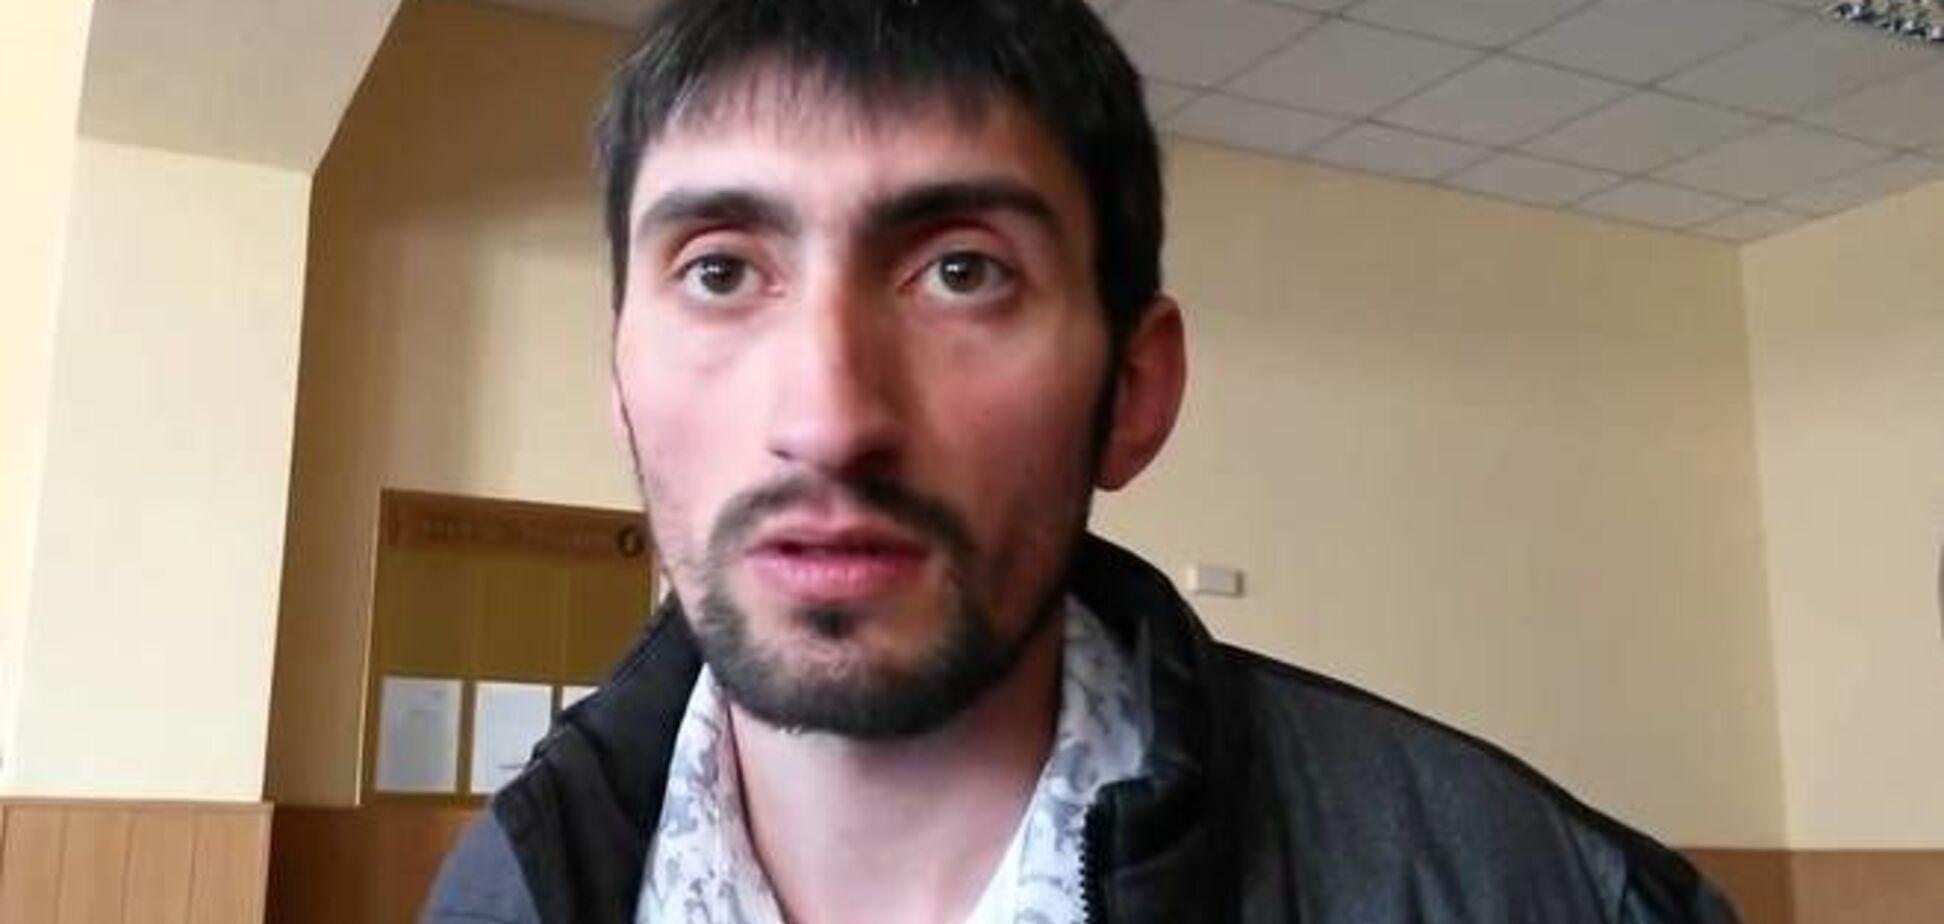 Без внесения залога: суд оставил антимайдановца 'Топаза' под арестом